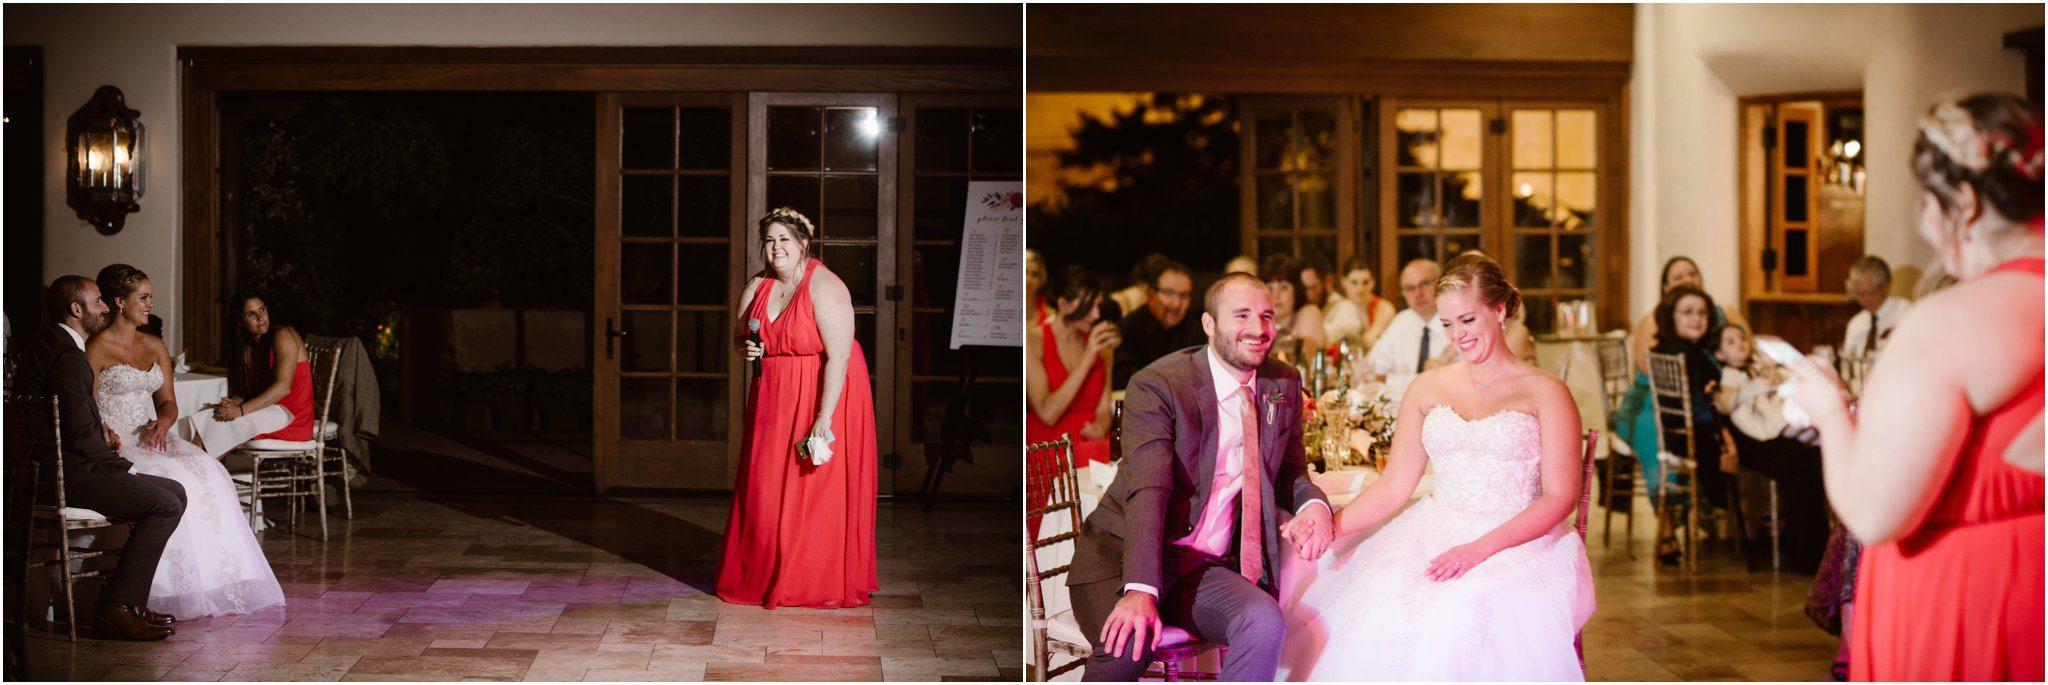 0086albuquerque-wedding-photographer_-santa-fe-wedding-photographer_-southwest-wedding-photography_-blue-rose-studio